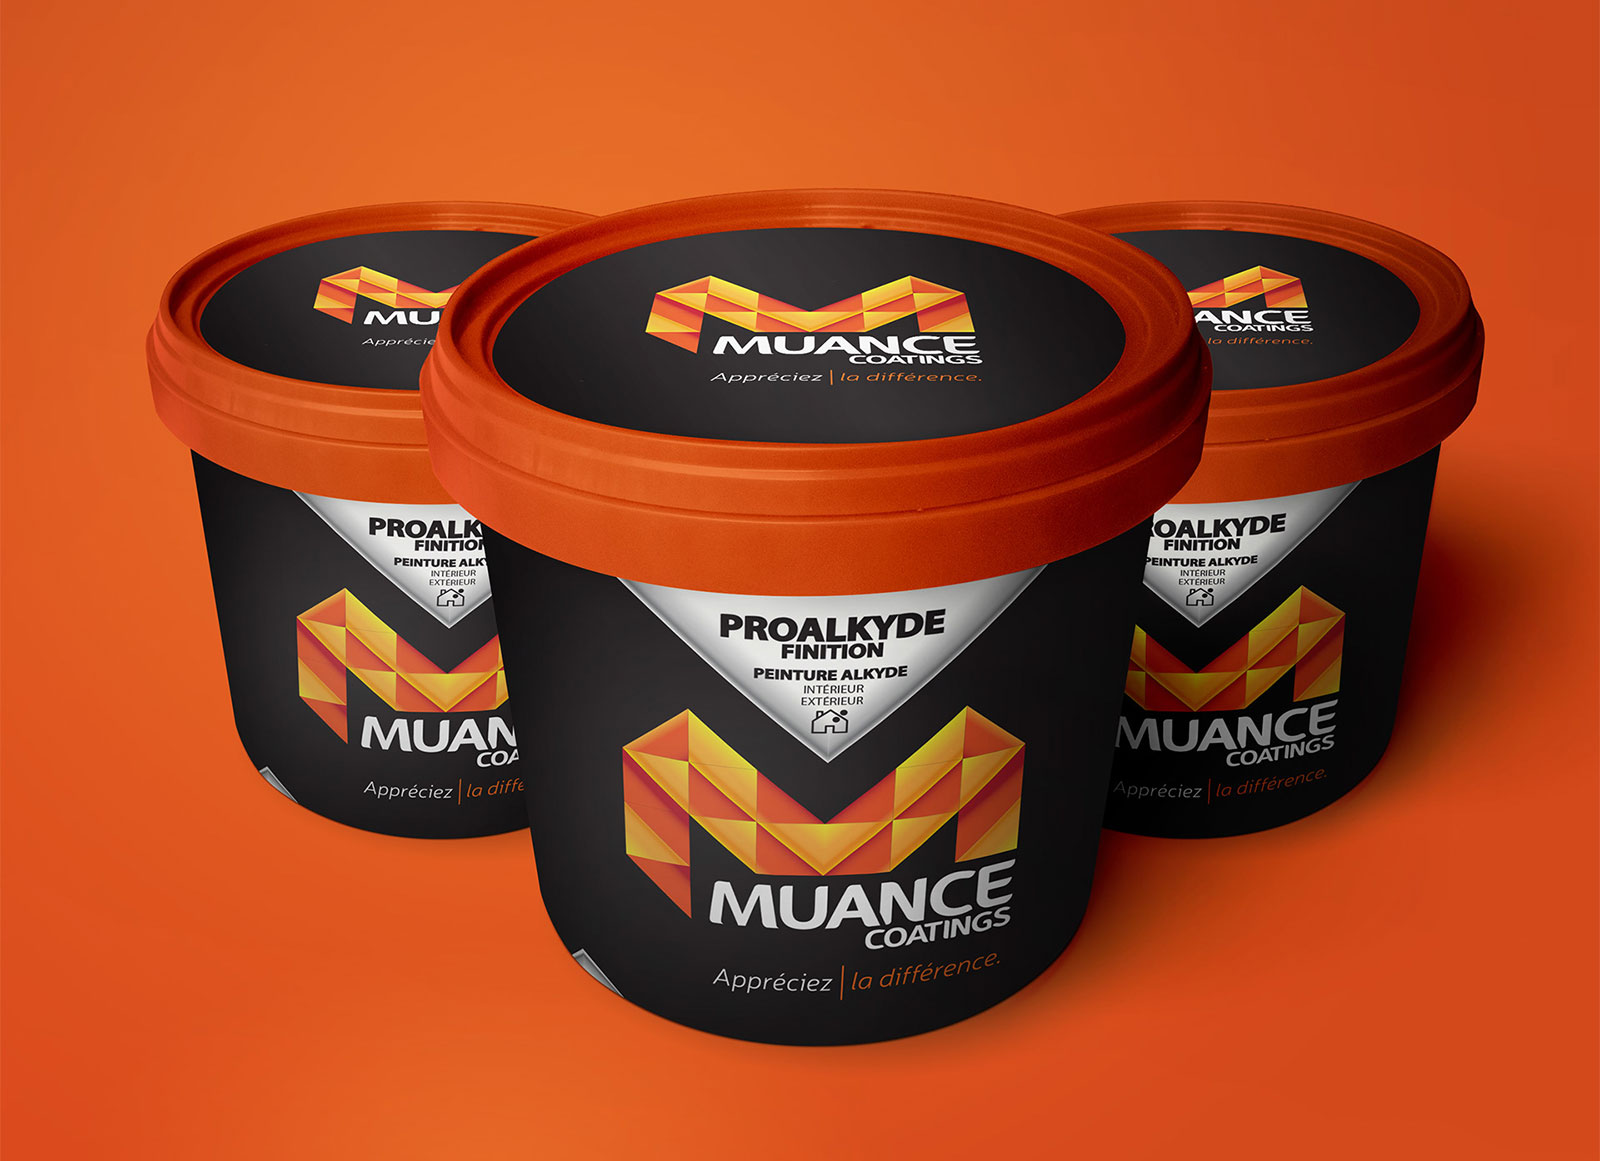 Free-Paint-Ice-Cream-Bucket-Mockup-PSD-2